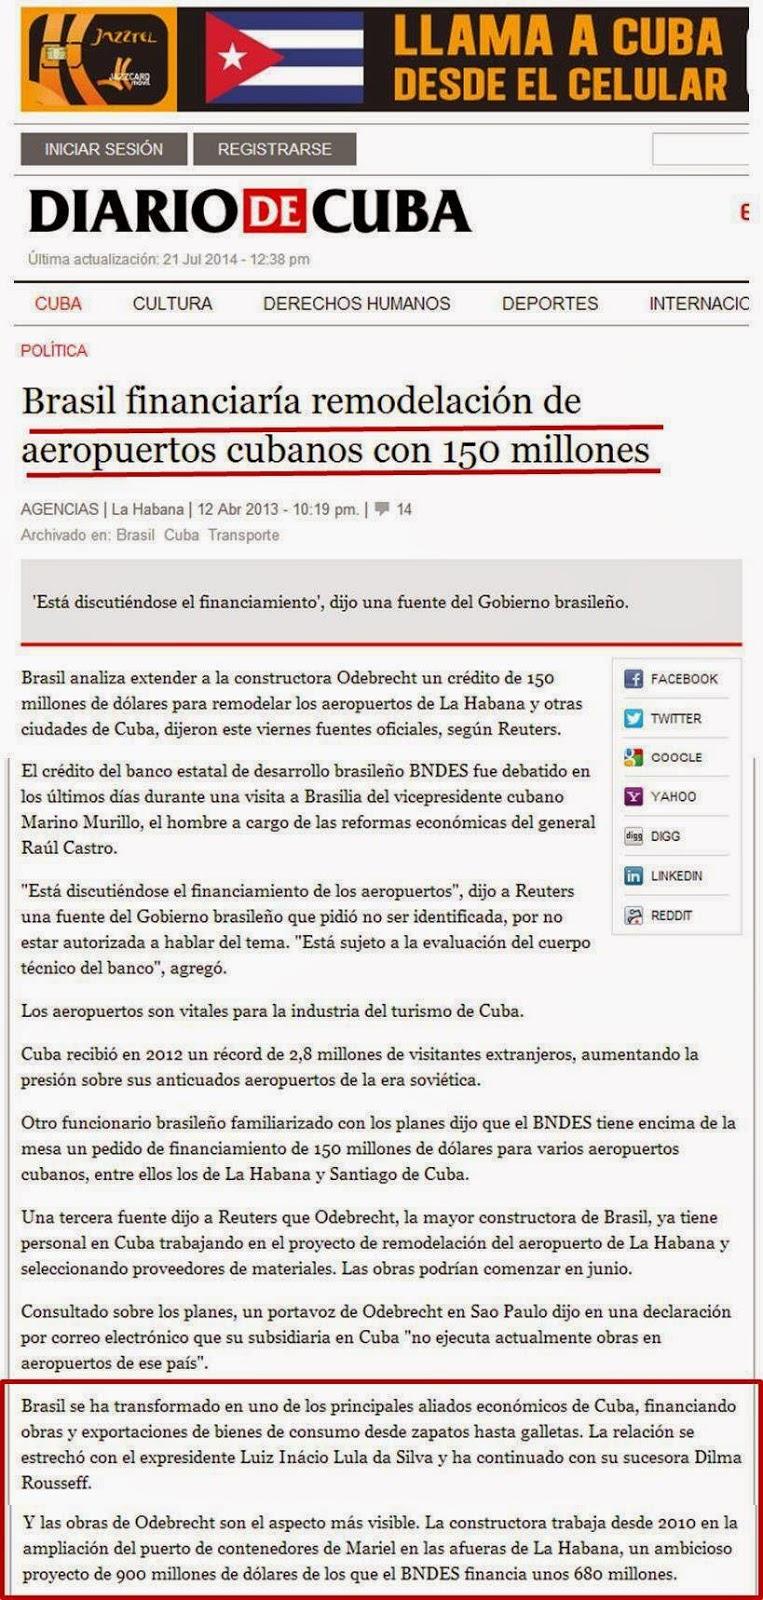 https://1.bp.blogspot.com/-t0G0QQcJttg/U8z1o5EXOTI/AAAAAAAAXzs/VCEyen3IaNA/s1600/Cuba+1.jpg